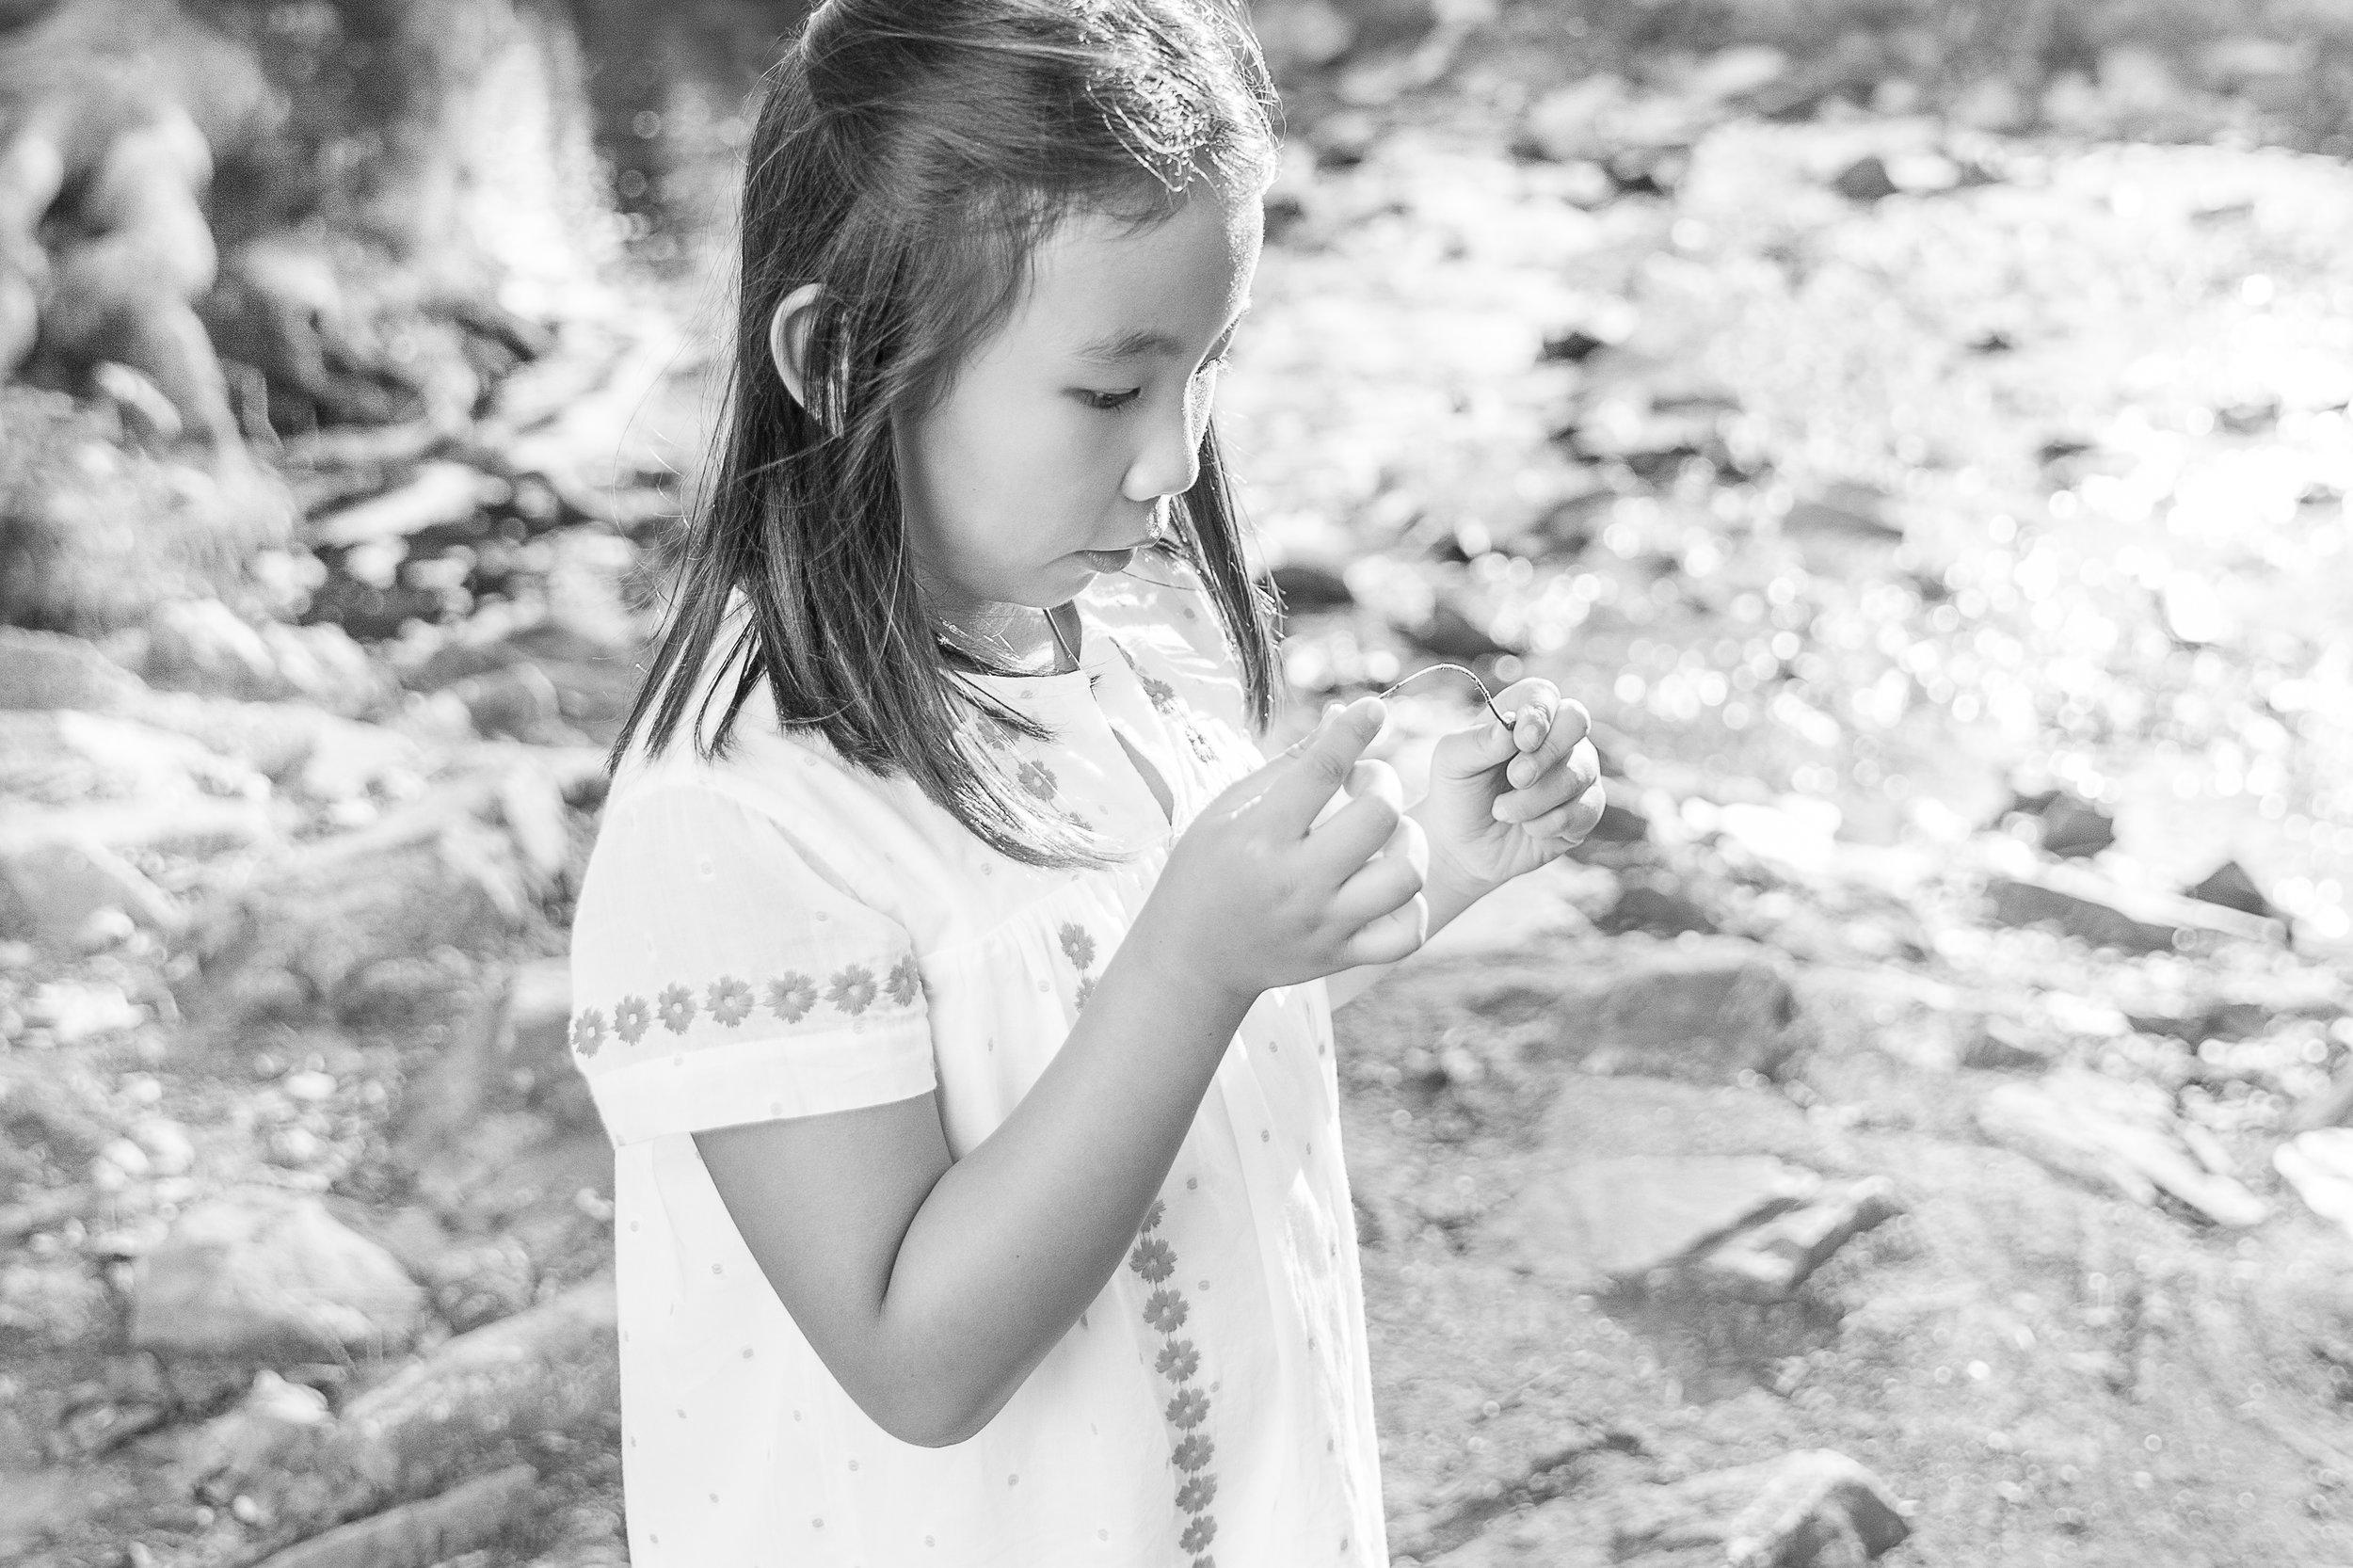 Kim-Pham-Clark-Photography-16.jpg